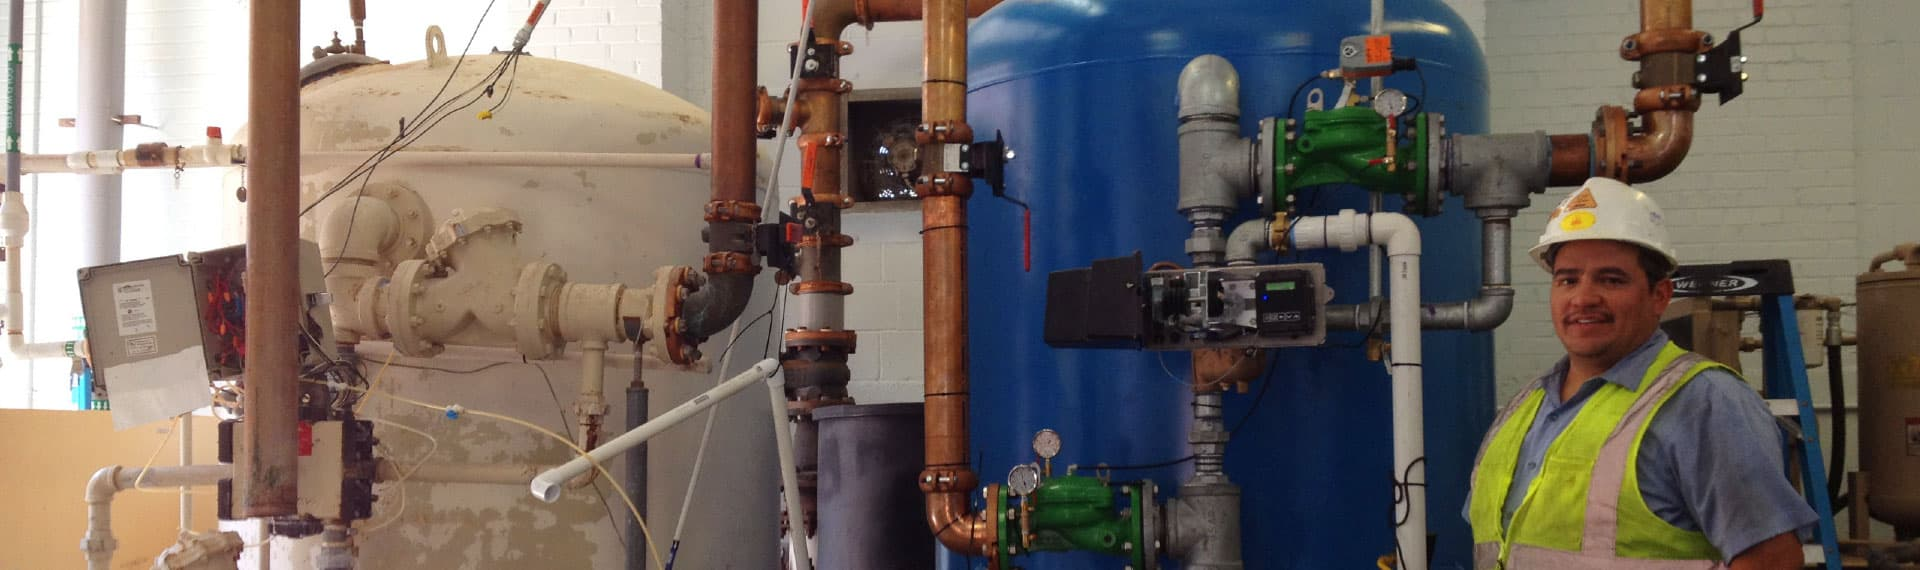 Raypak boilers| hydromatic pumps | commercial water softeners | Heat & Treat expert technician | Heat & Treat Texas